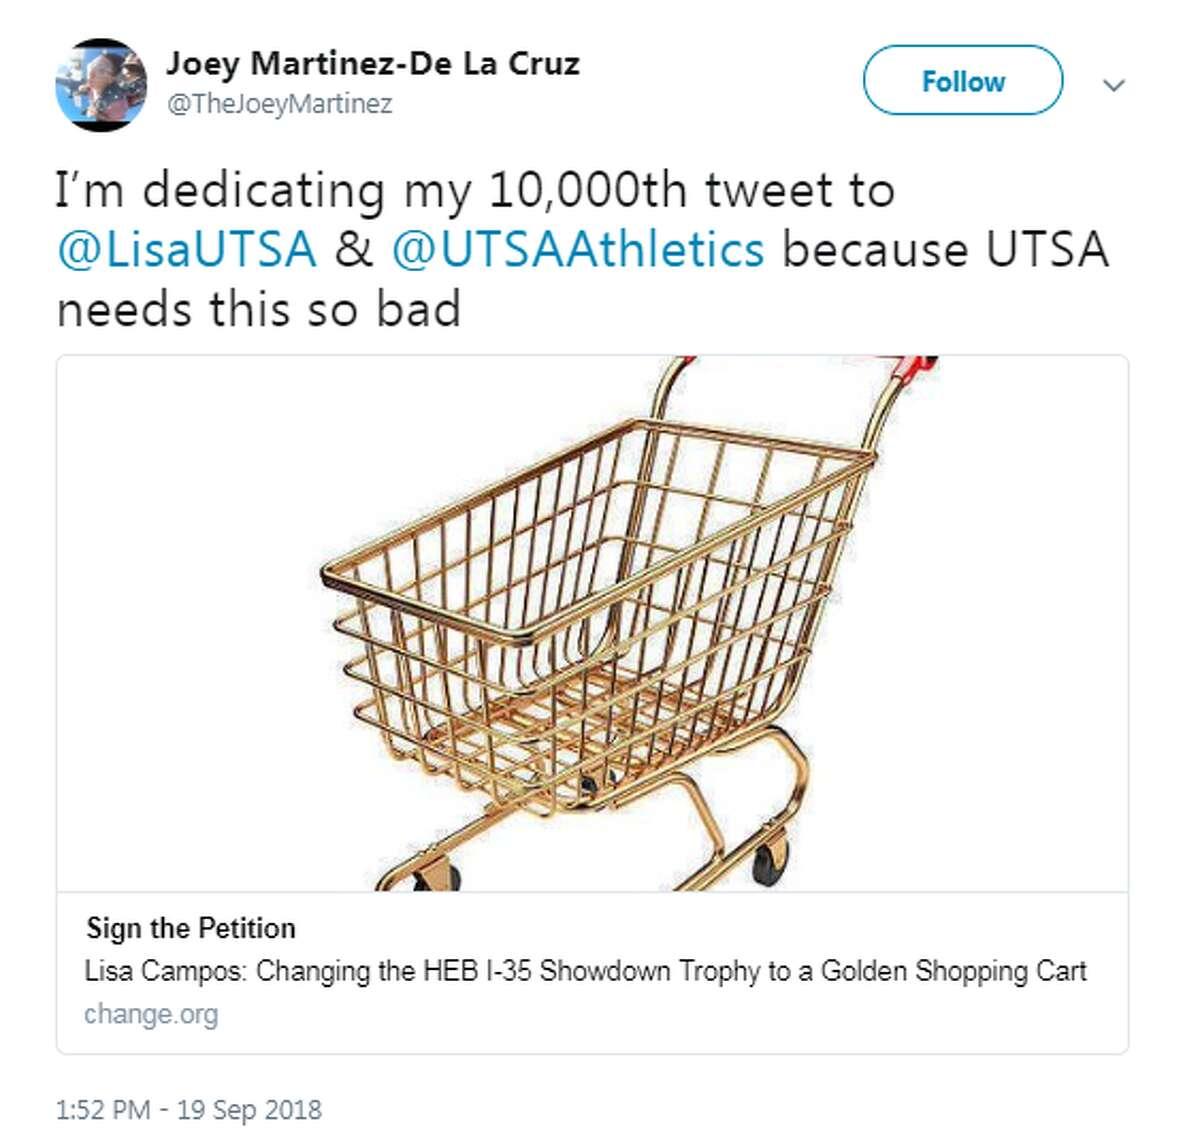 @TheJoeyMartinez: I'm dedicating my 10,000th tweet to @LisaUTSA & @UTSAAthletics because UTSA needs this so bad